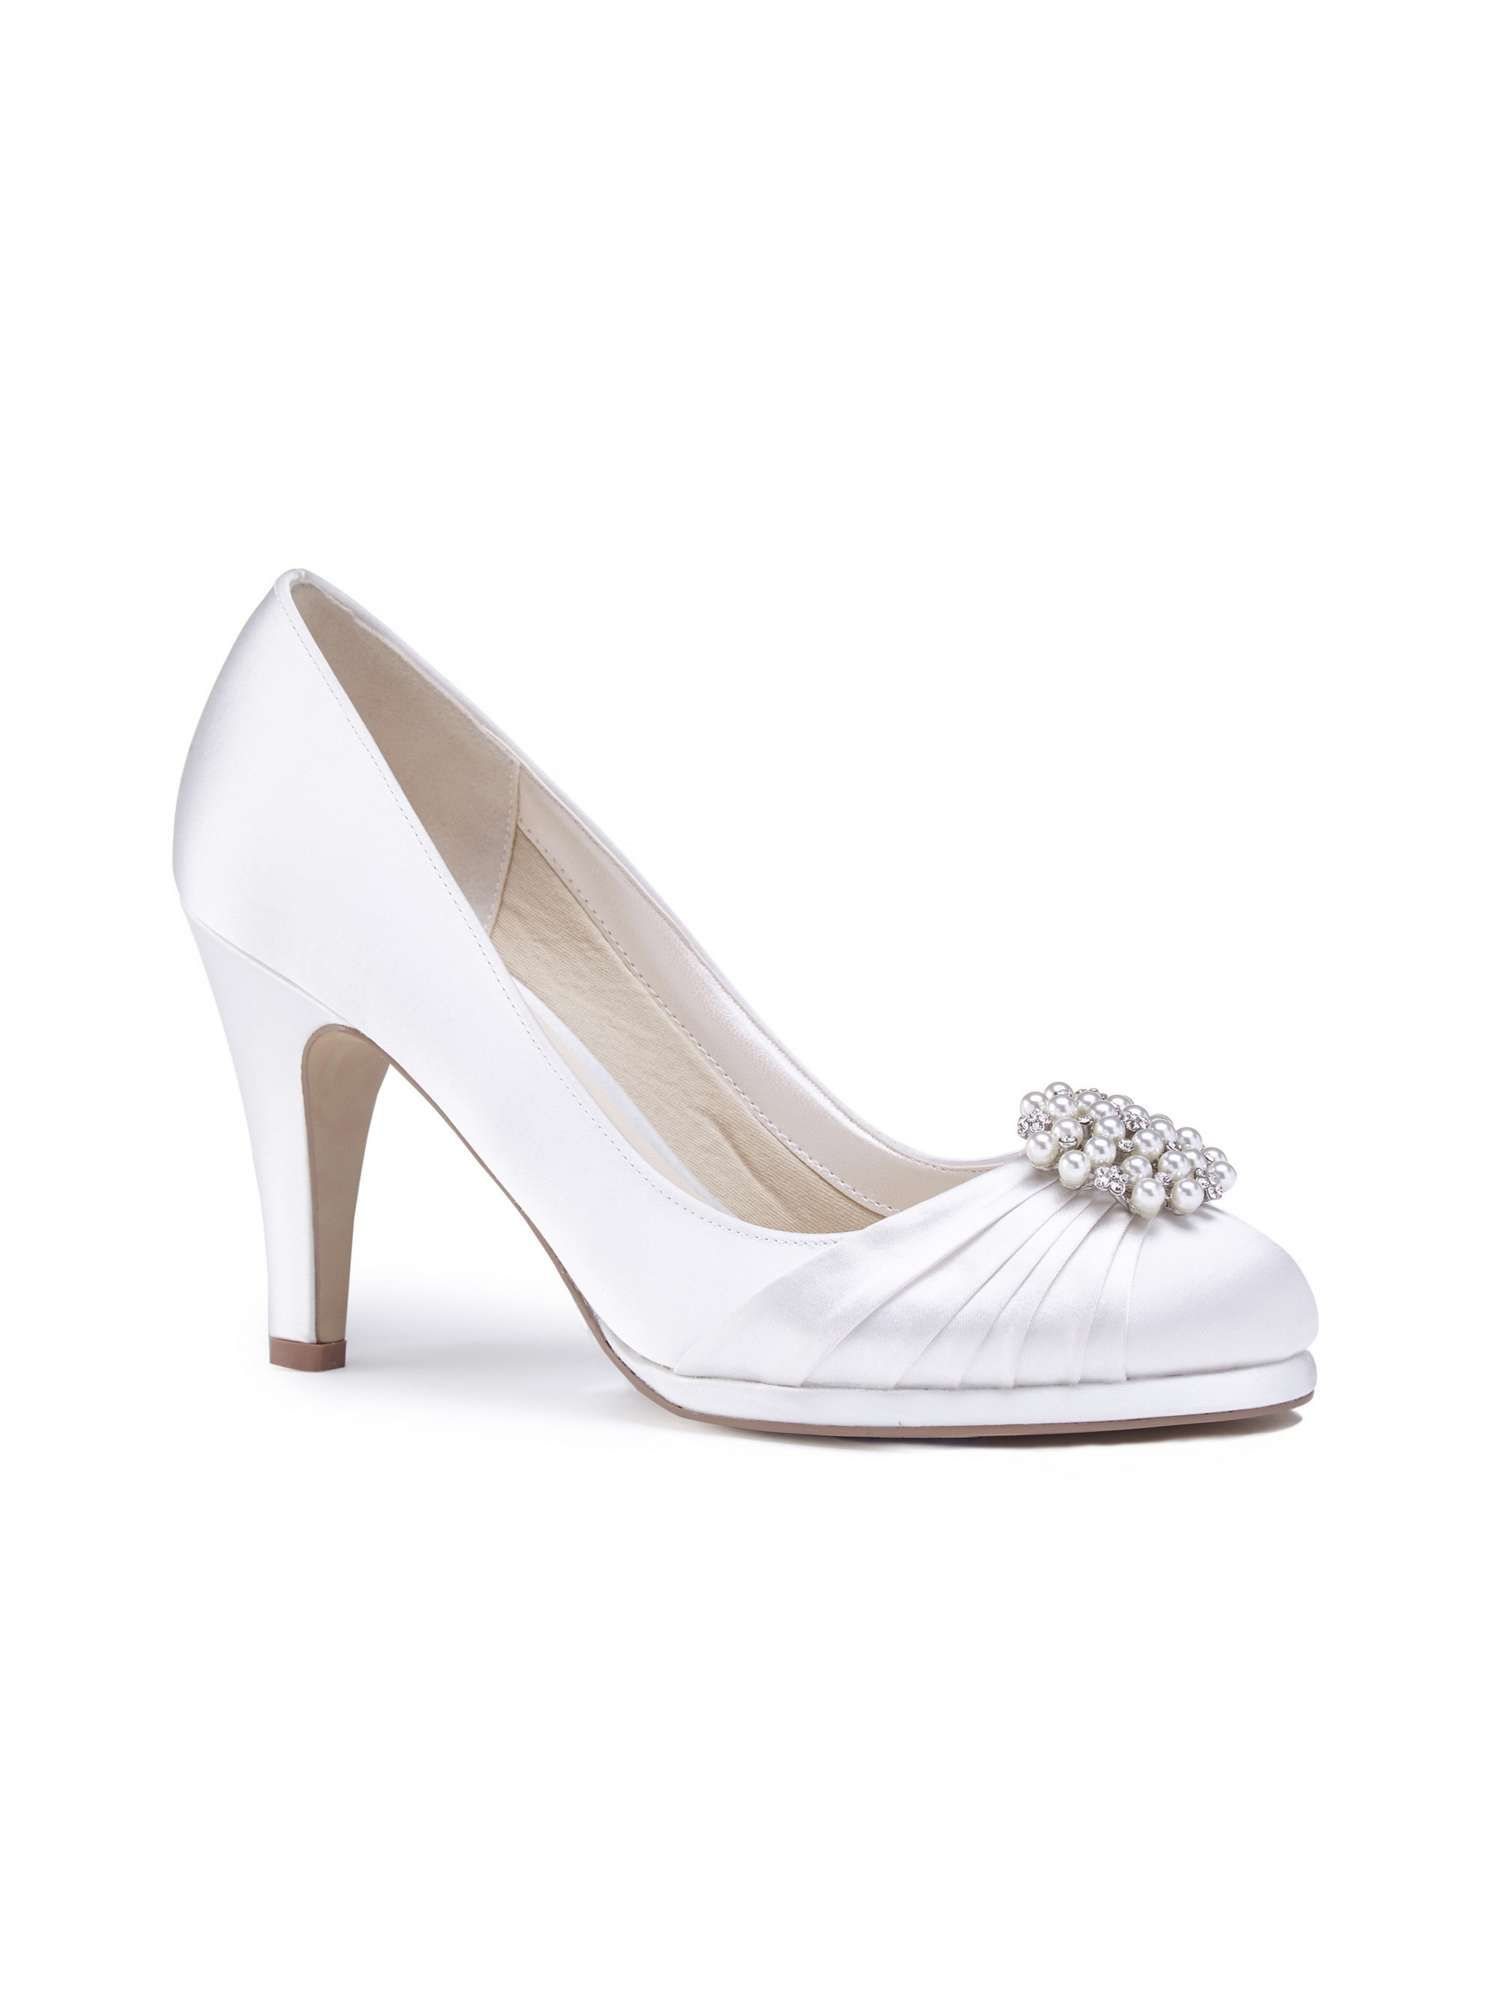 Paradox London Pink Amaia High Heel Platform Court Shoes | Pinterest ...